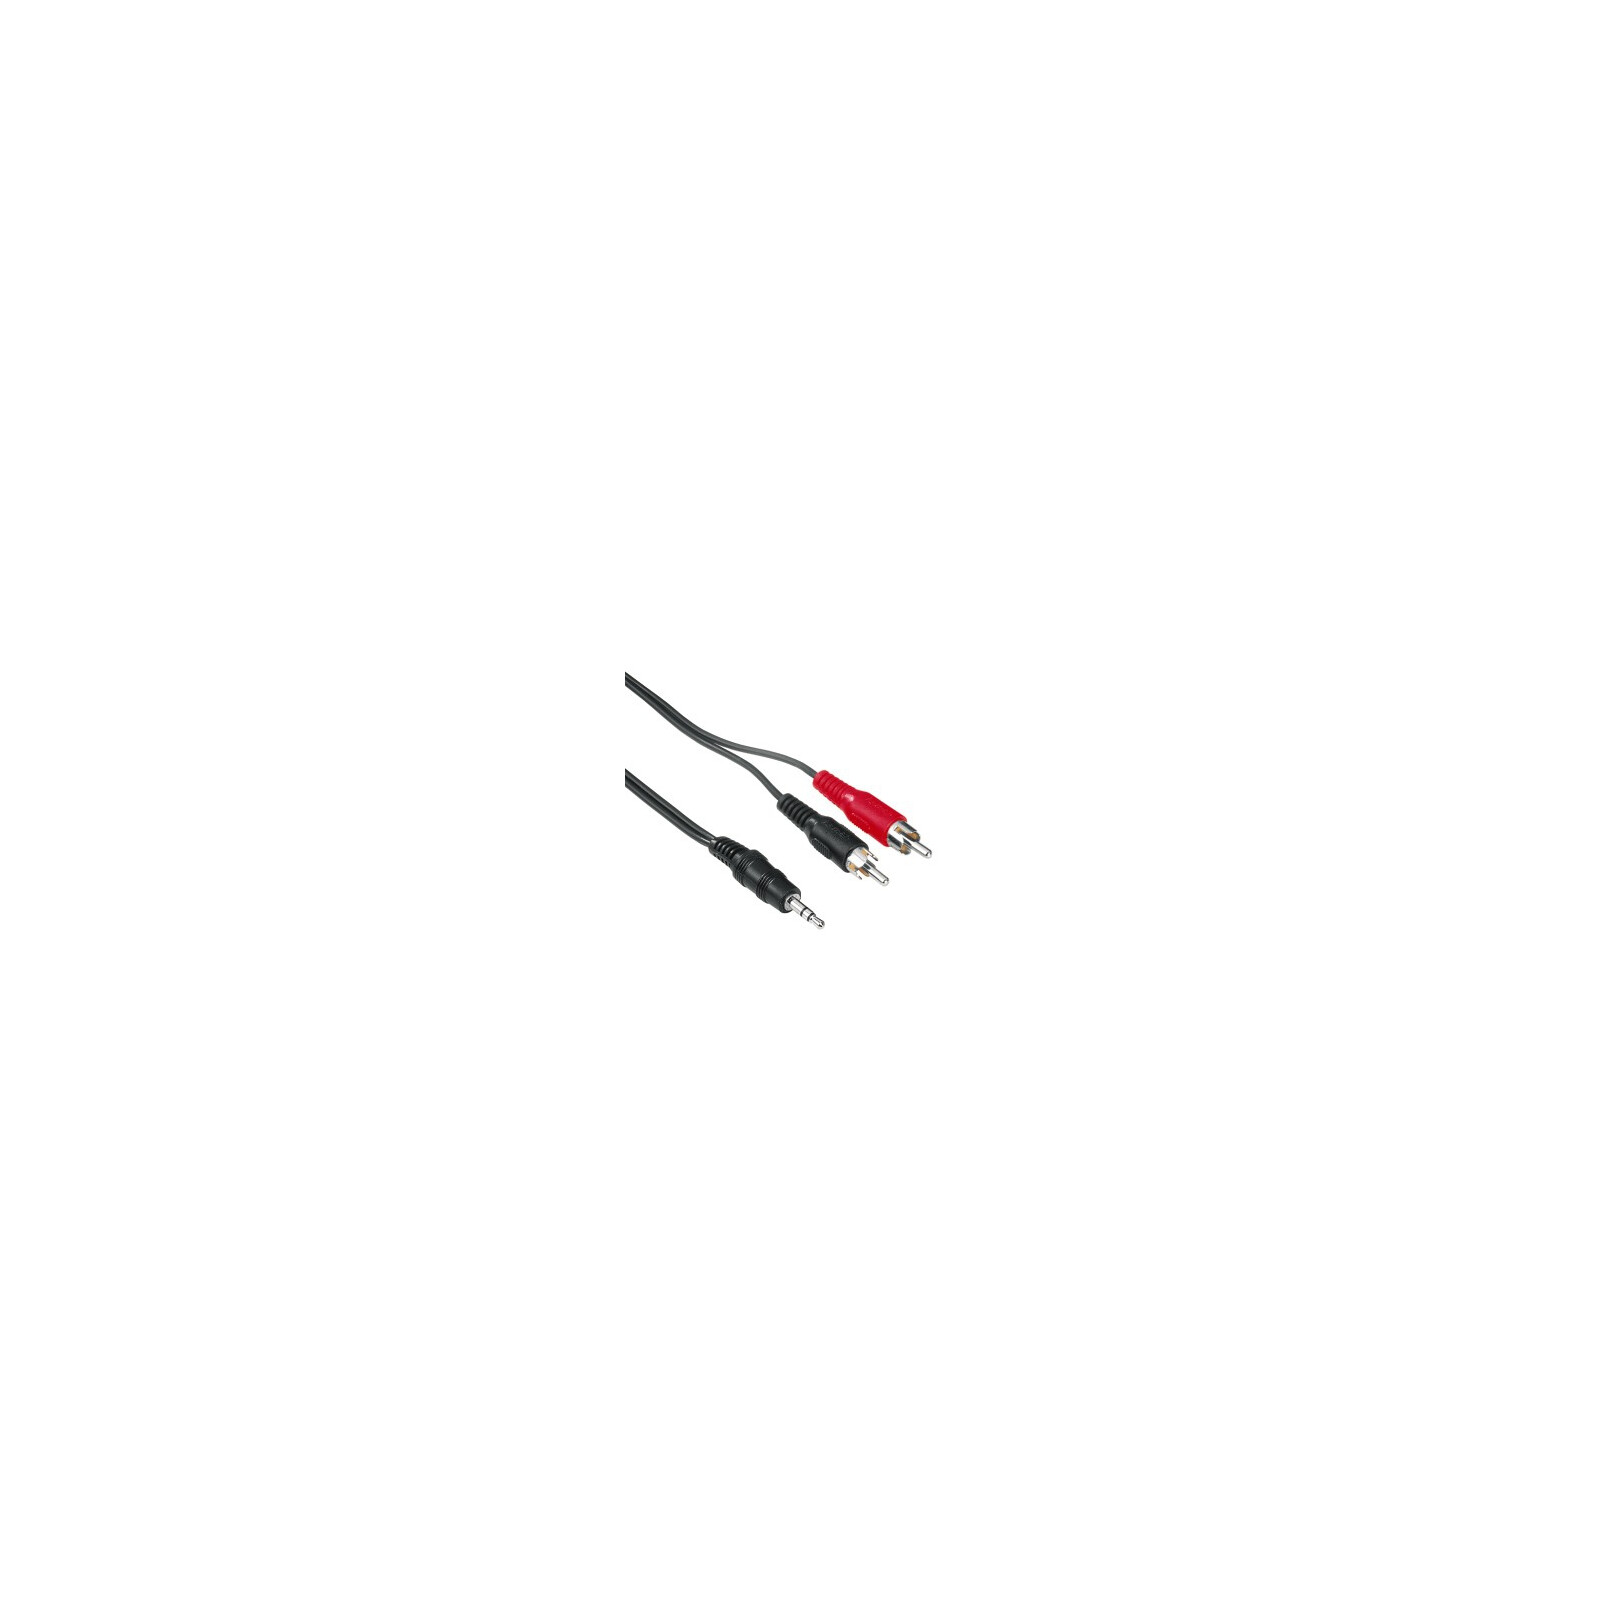 Hama 78479 2Cinch Stecker 3,5mm Klinkestecker Stereo 3m